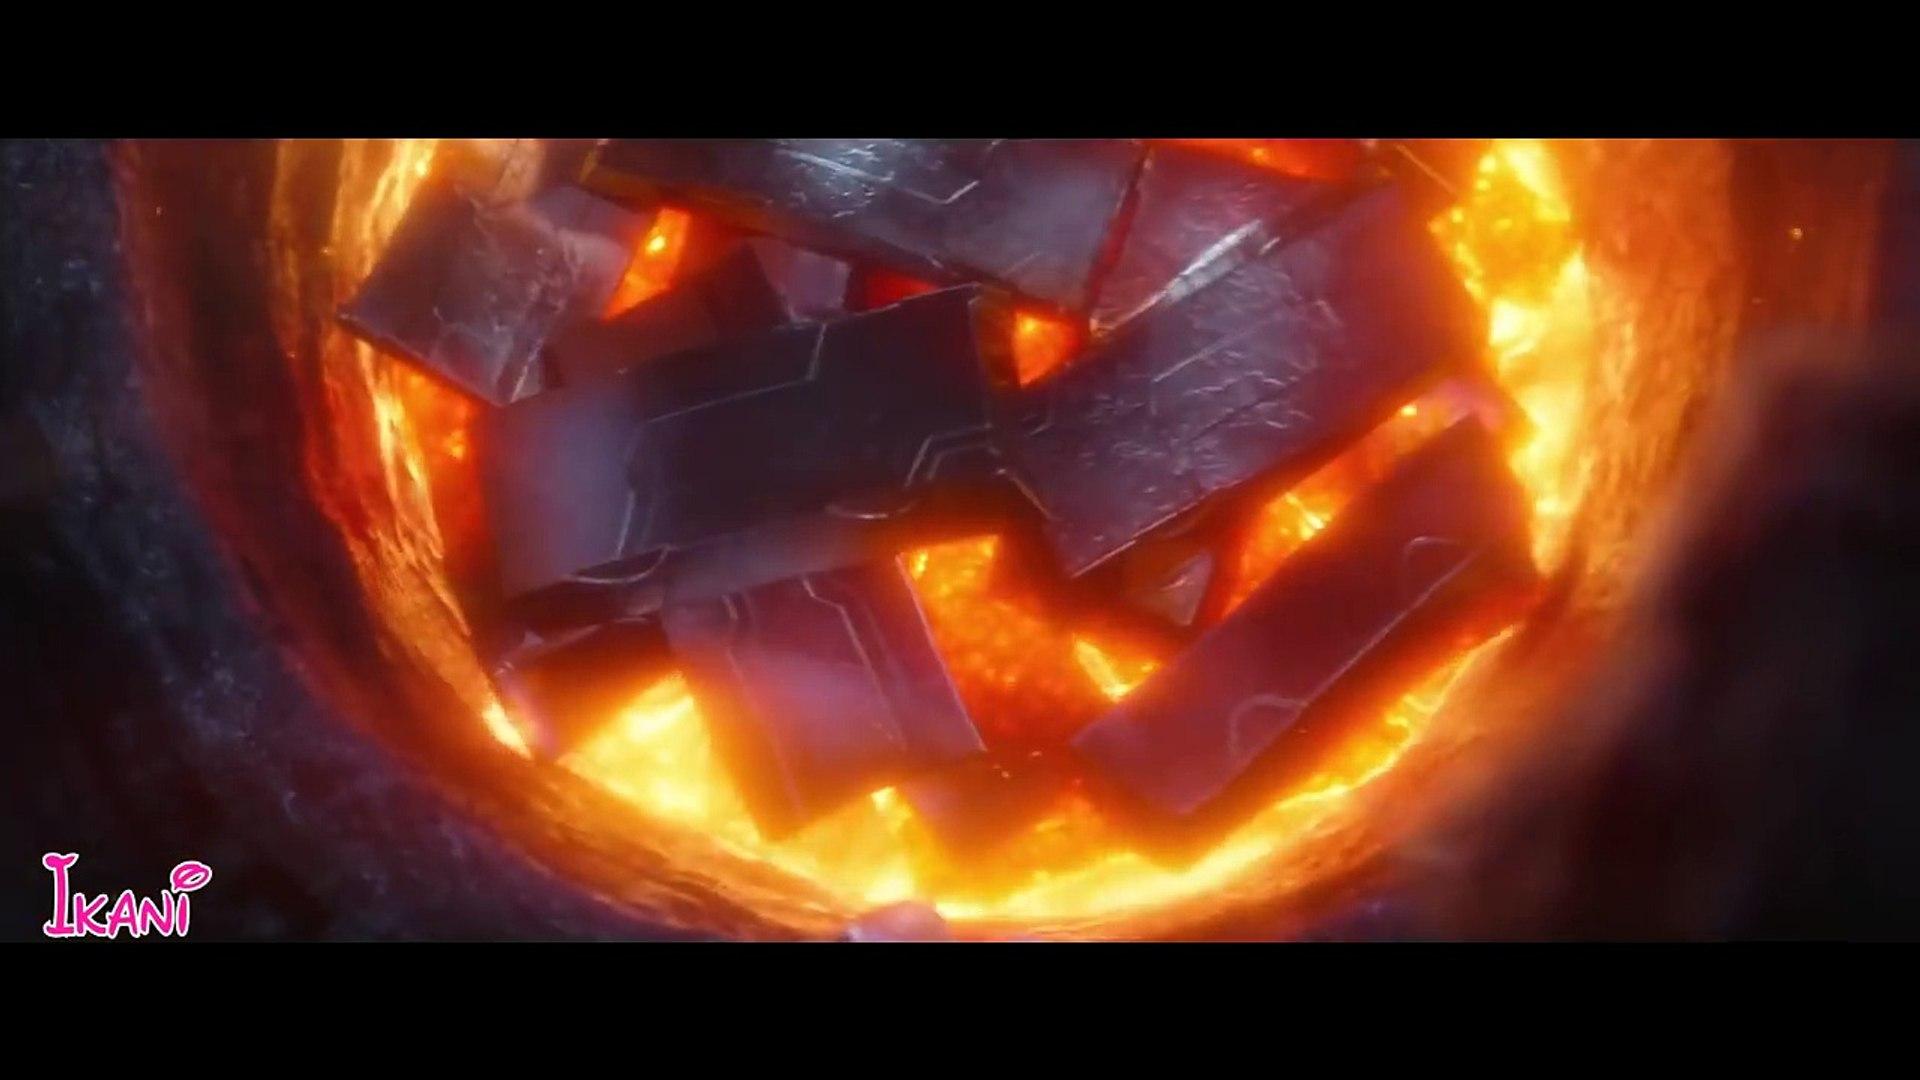 Avengers- Infinity War 2018 - Thanos vs Avengers - Best Scenes, The Final  Battle | Best Movie scenes